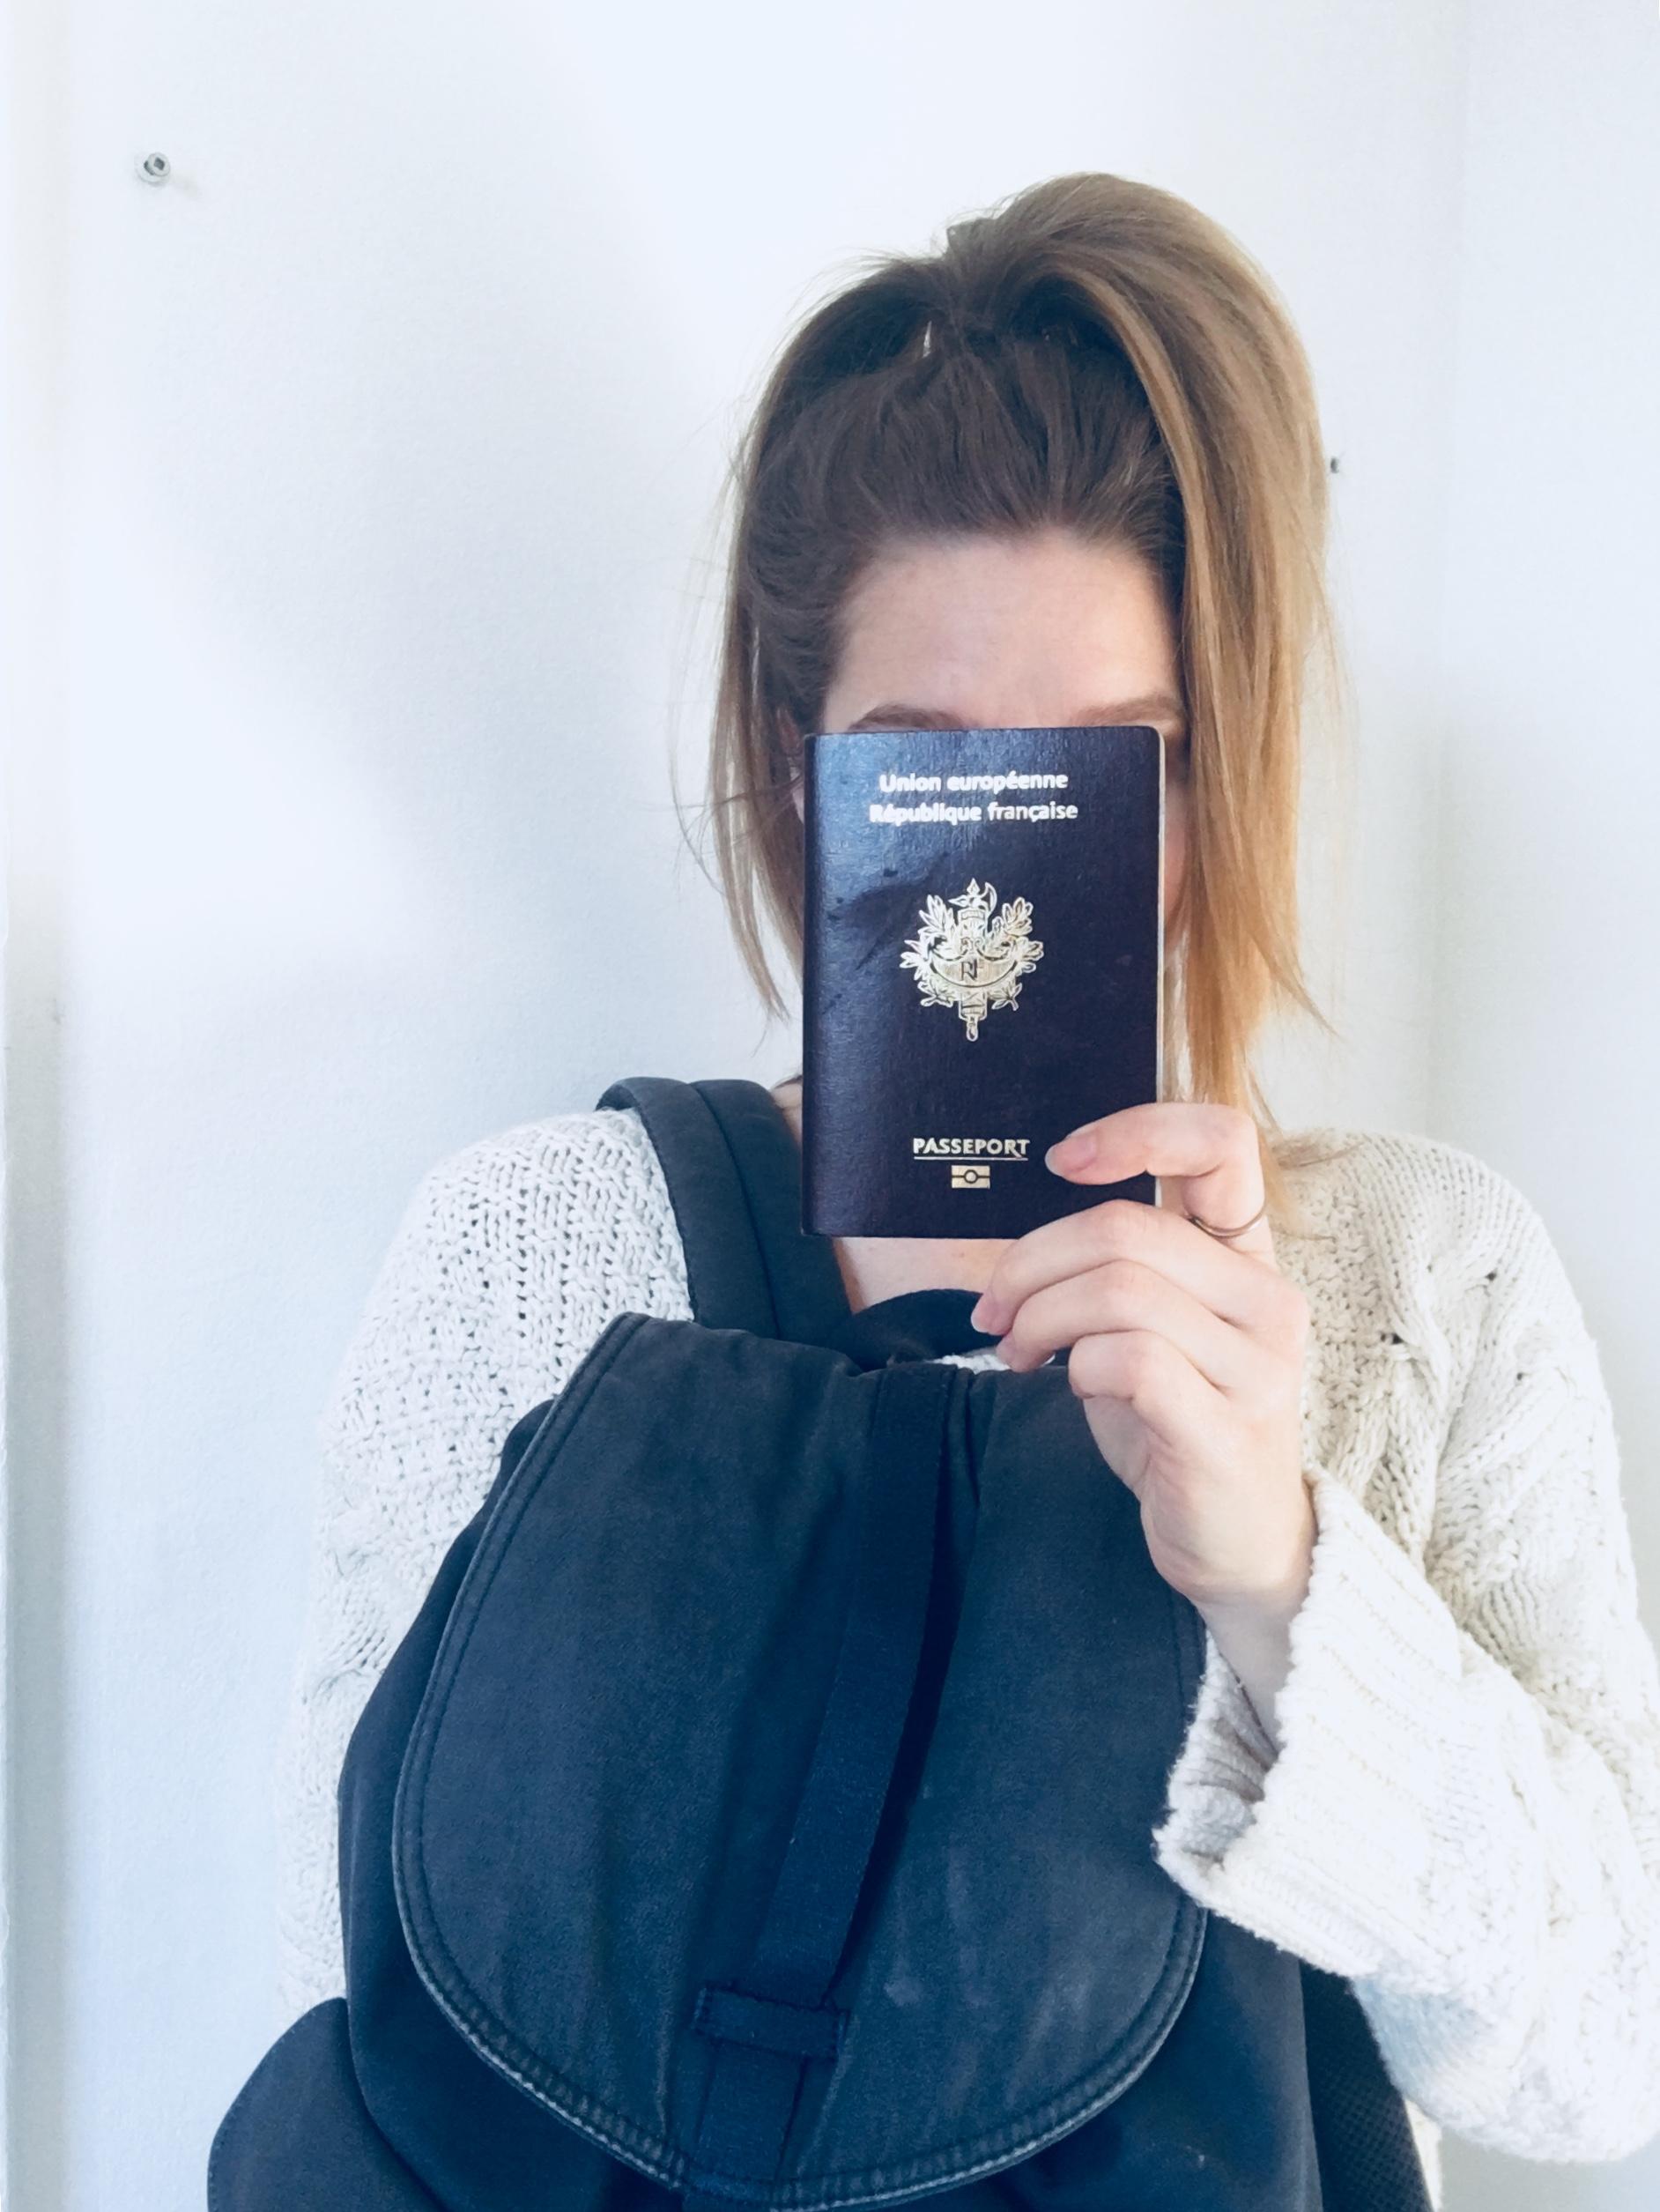 Expatriation-et-minimalisme_ConsommationRebelle